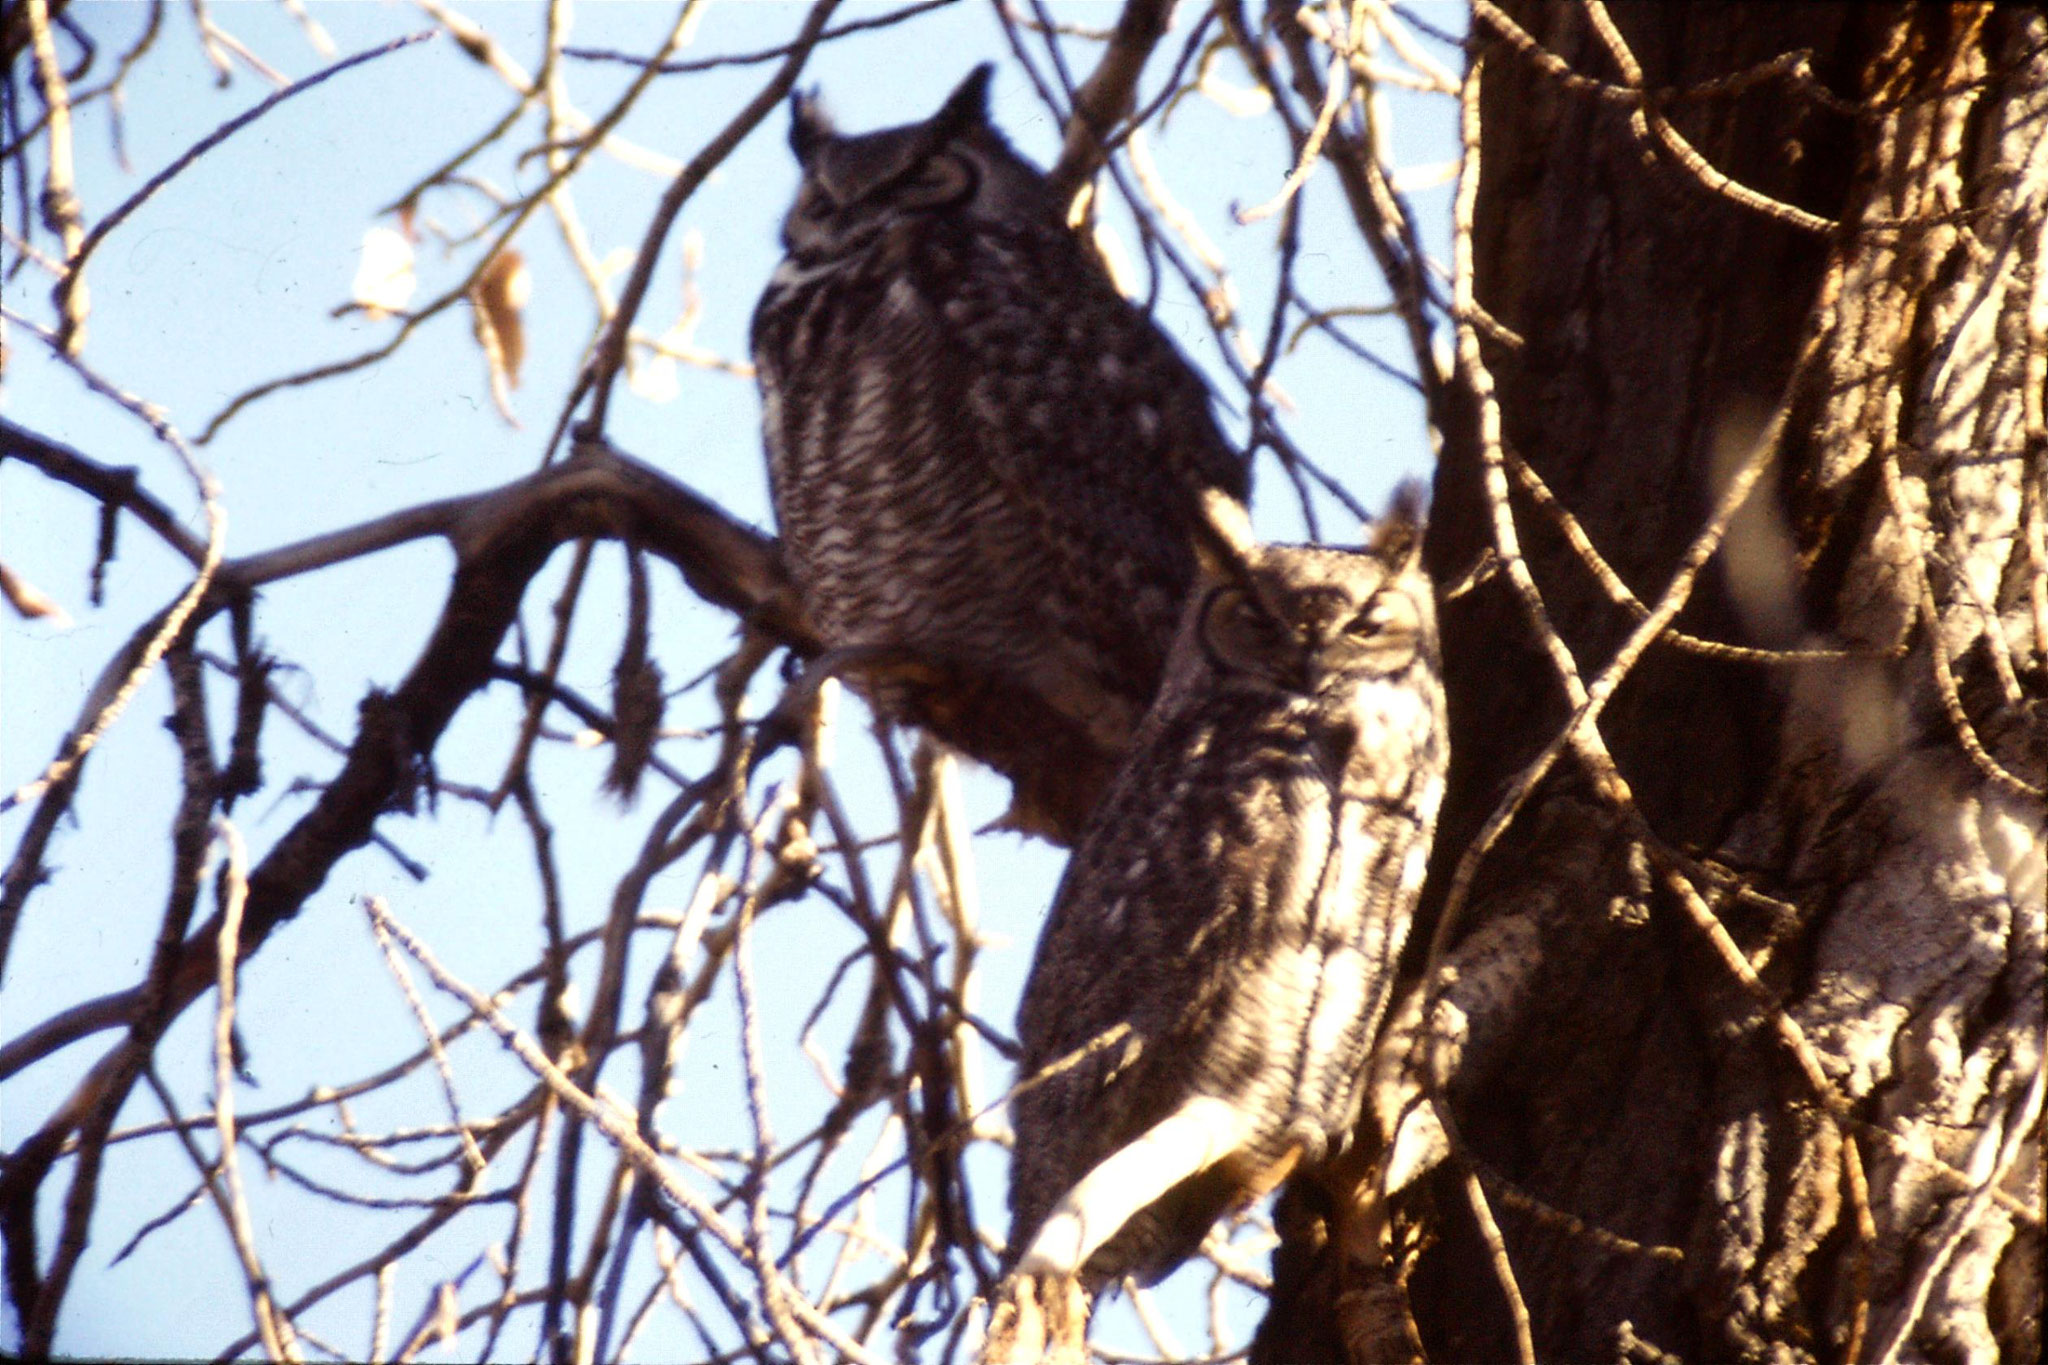 23/1/1991: 26: Gt Horned owls